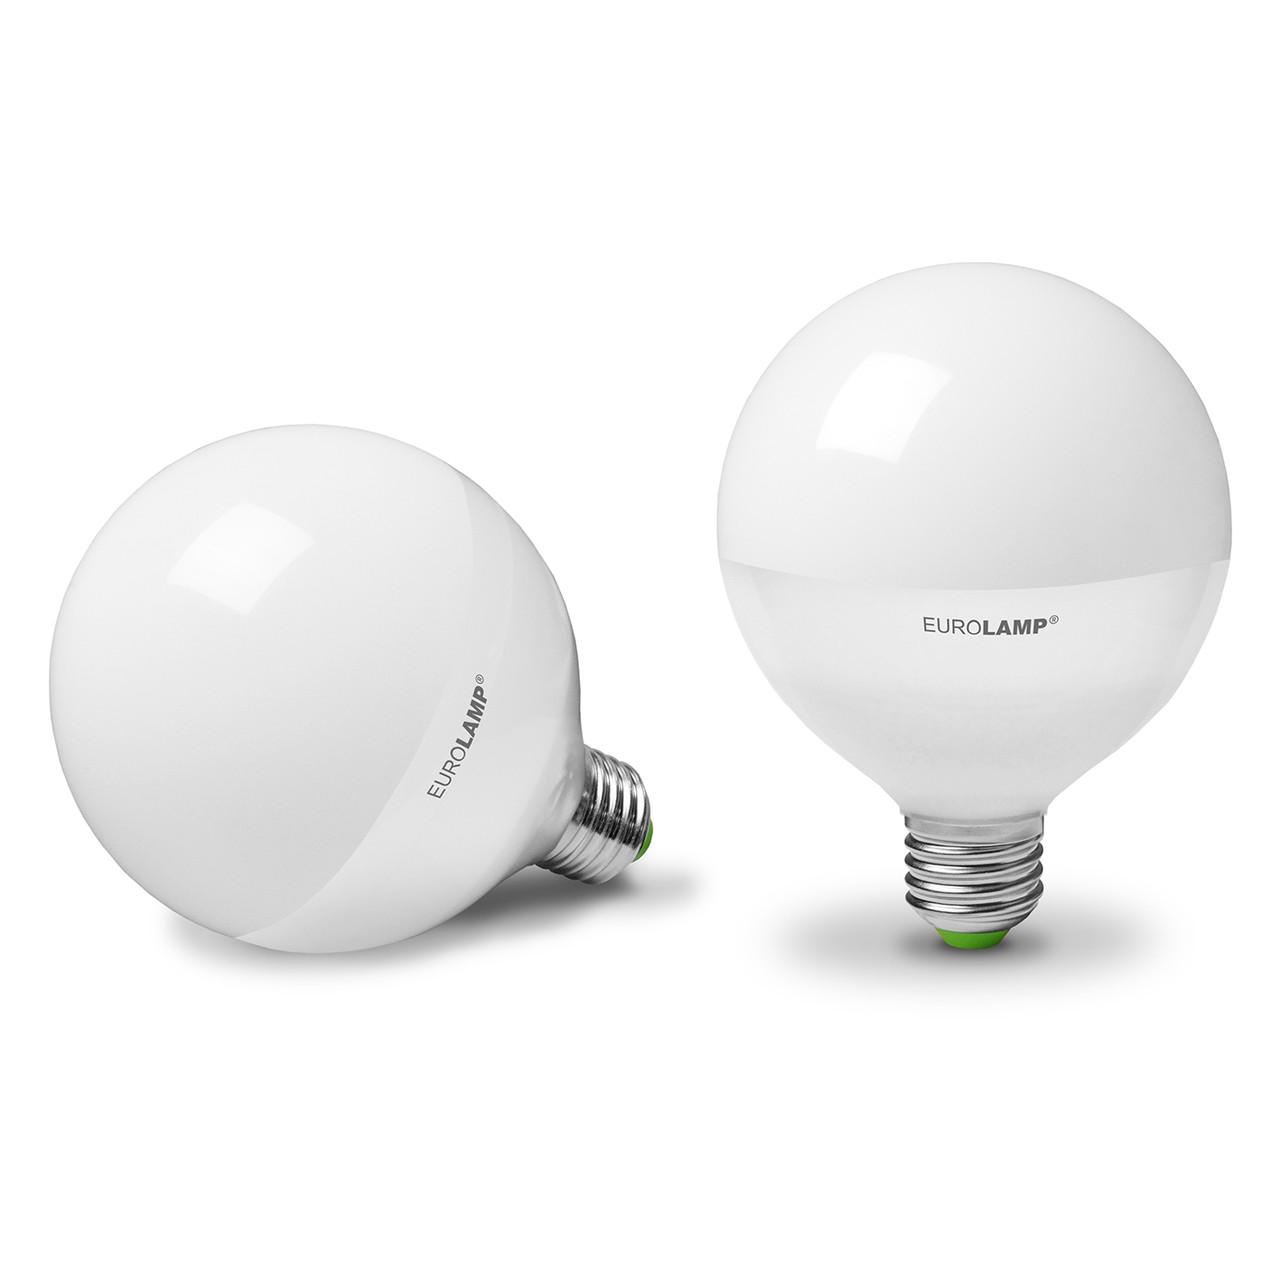 EUROLAMP LED Лампа ЕКО G95 15W E27 3000K